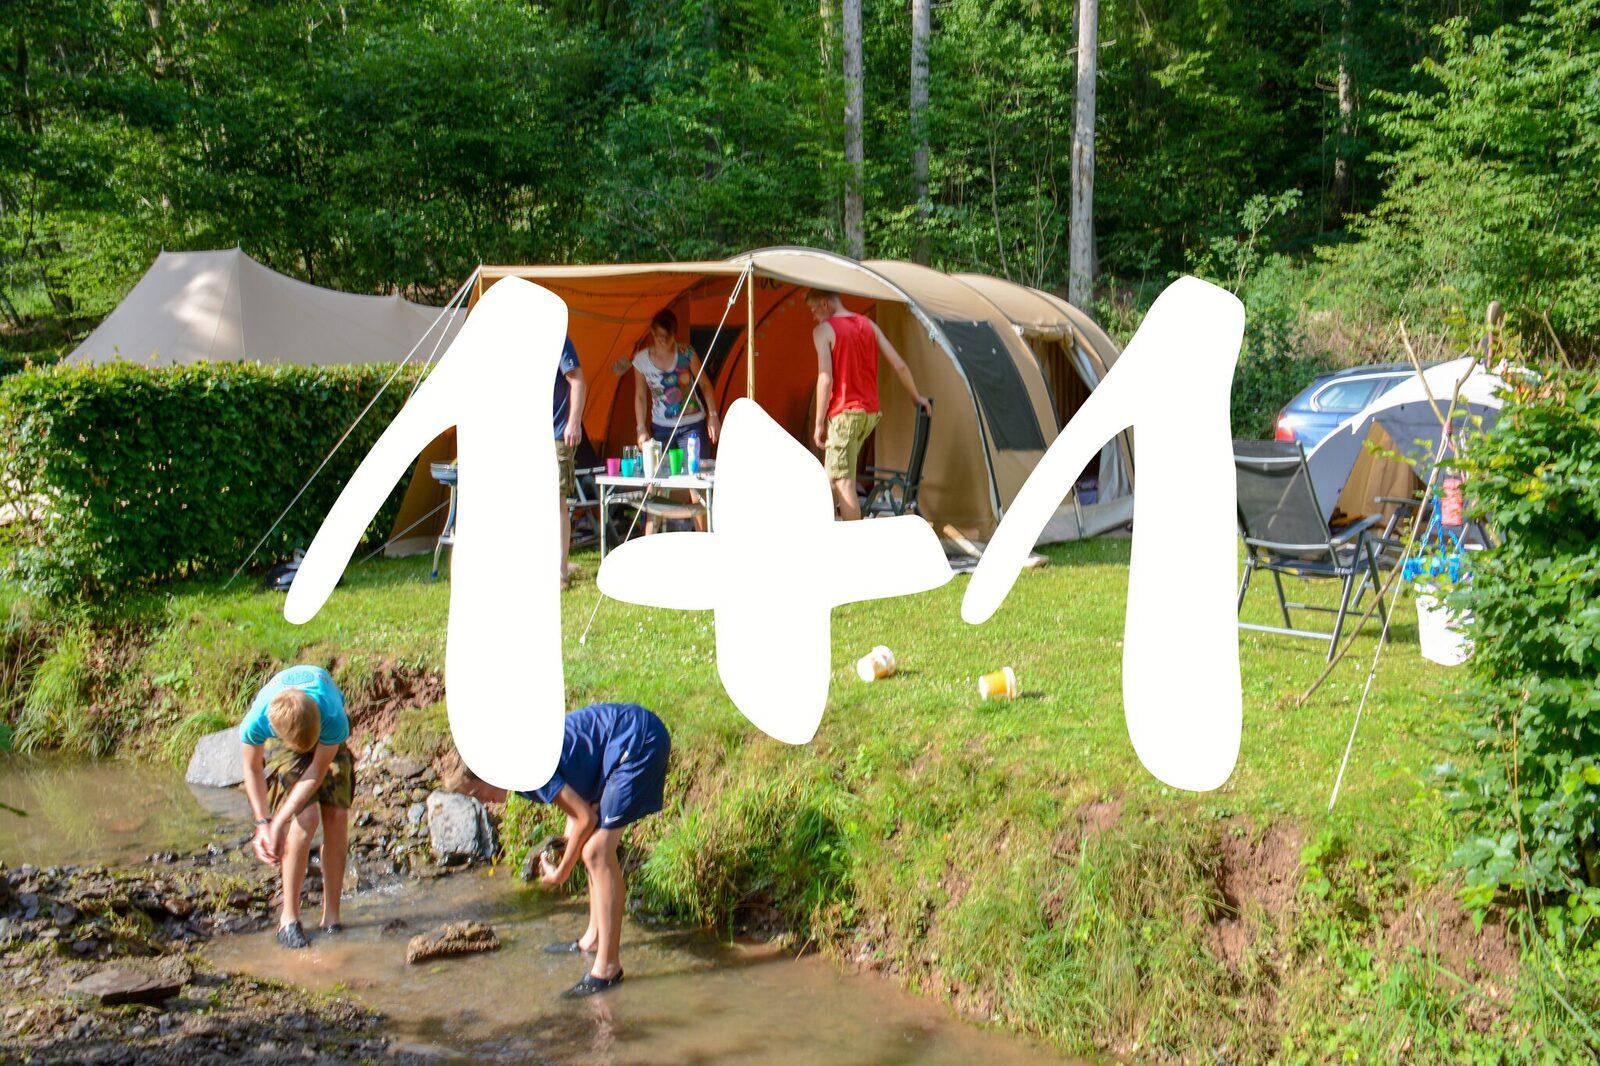 Walsdorf: 1+1 weeks camping